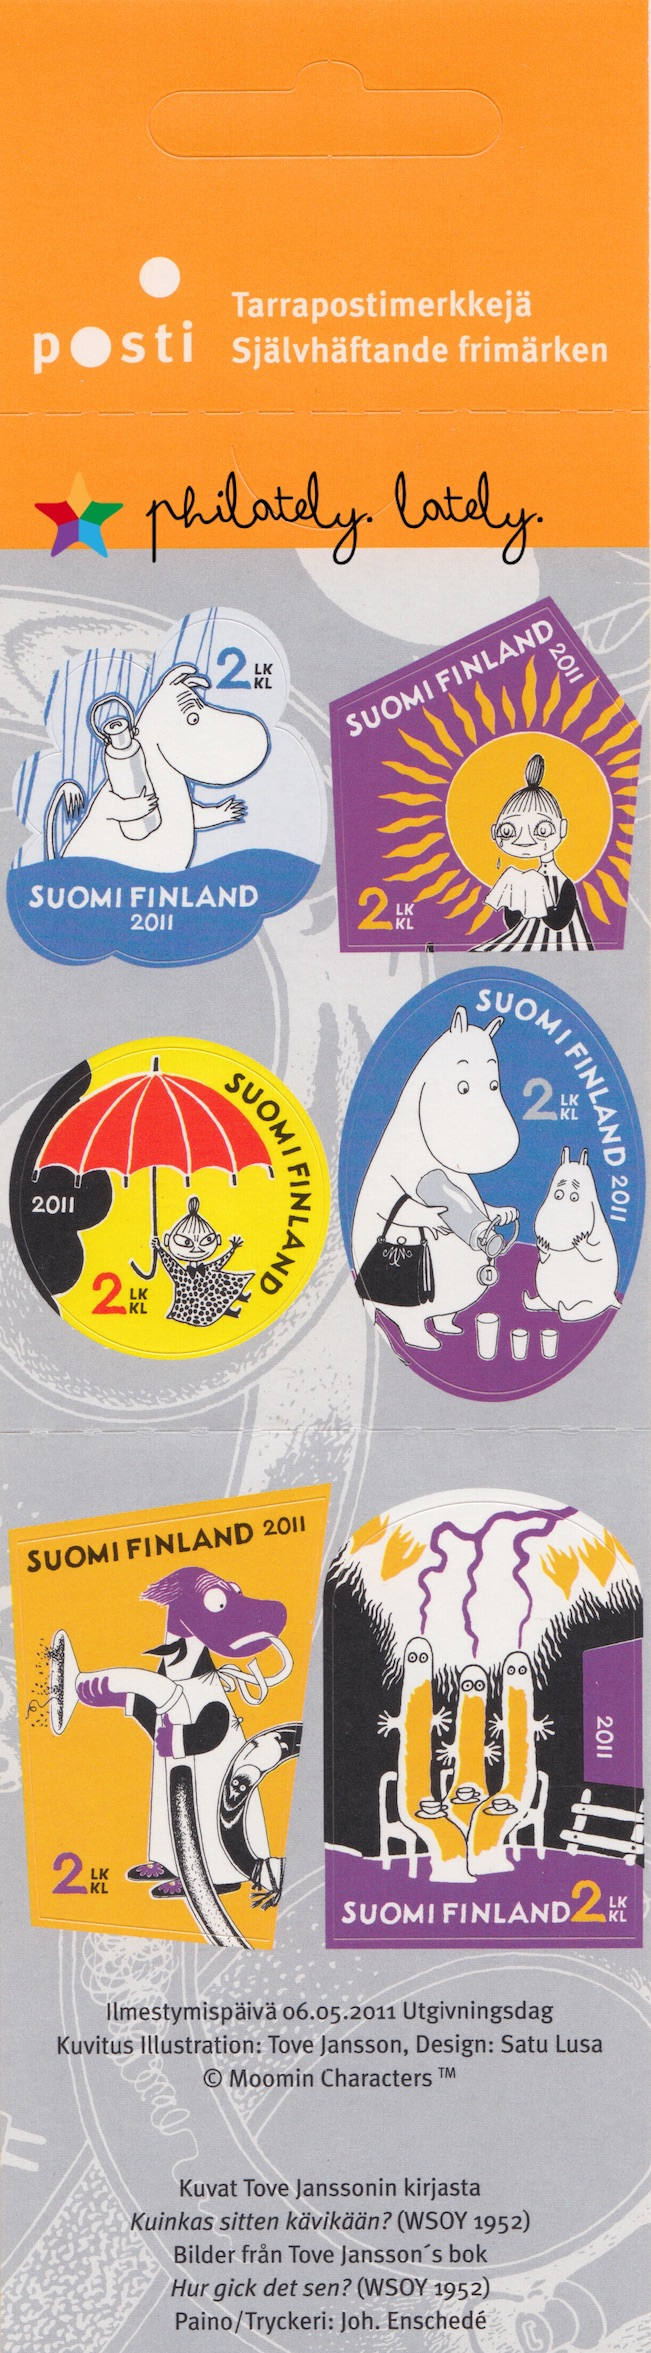 002_Finland_Moomin_Stamps.jpg